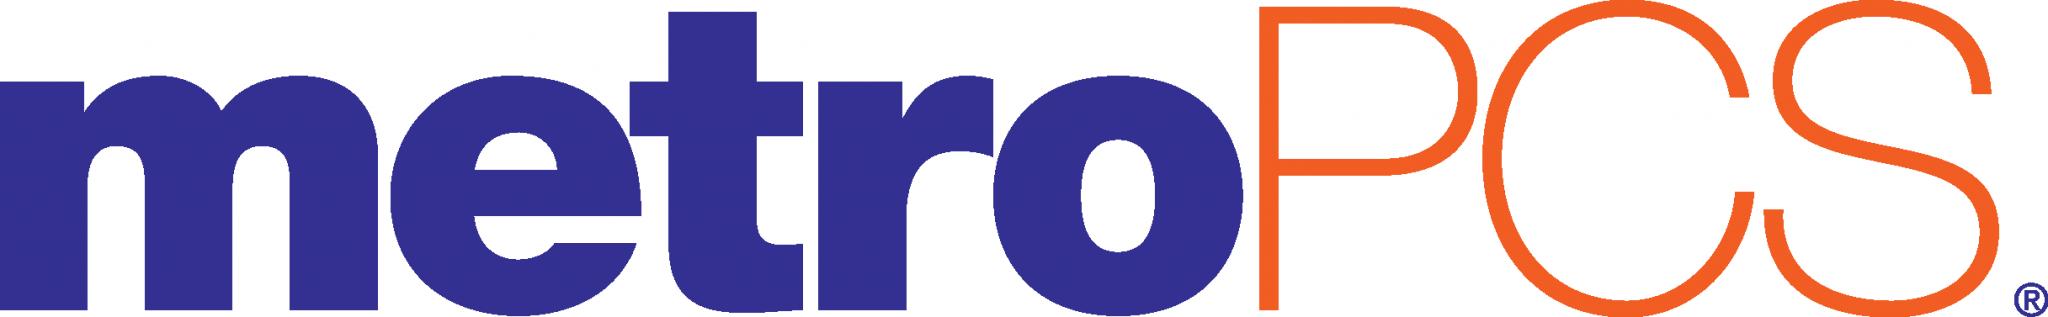 metropcs-logo.png